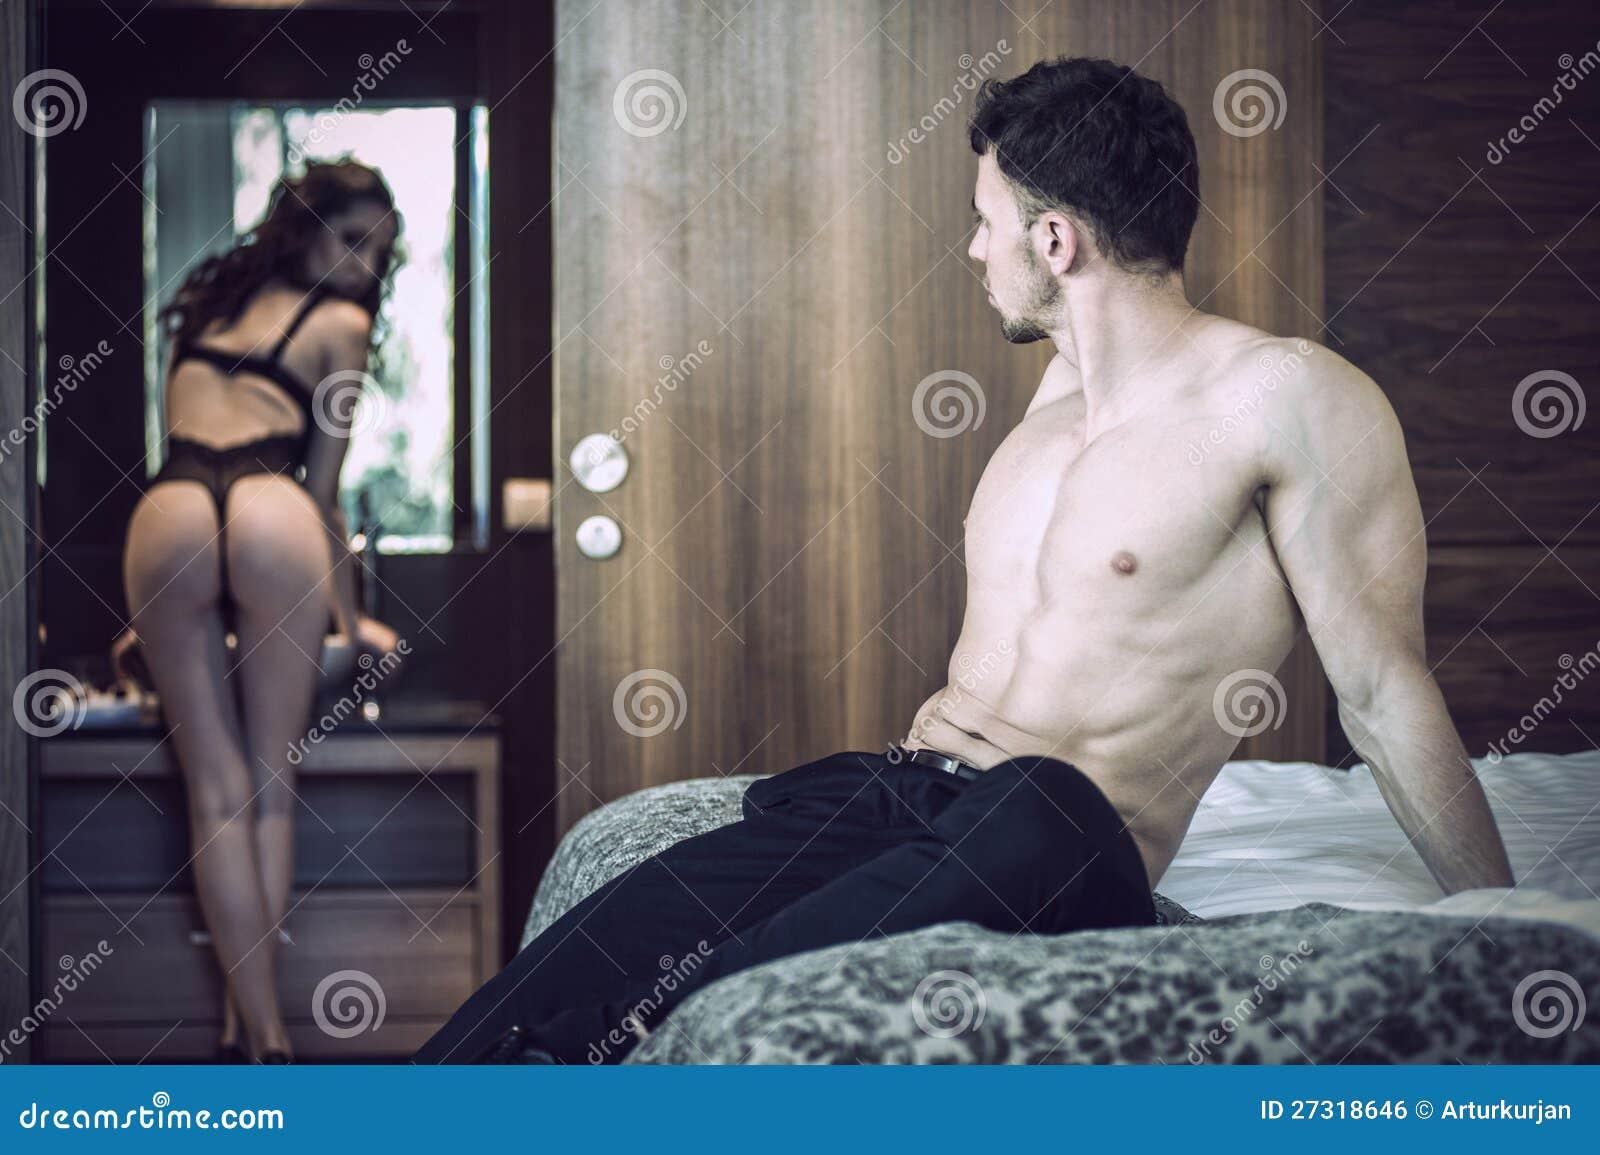 porno download erotiske bilder